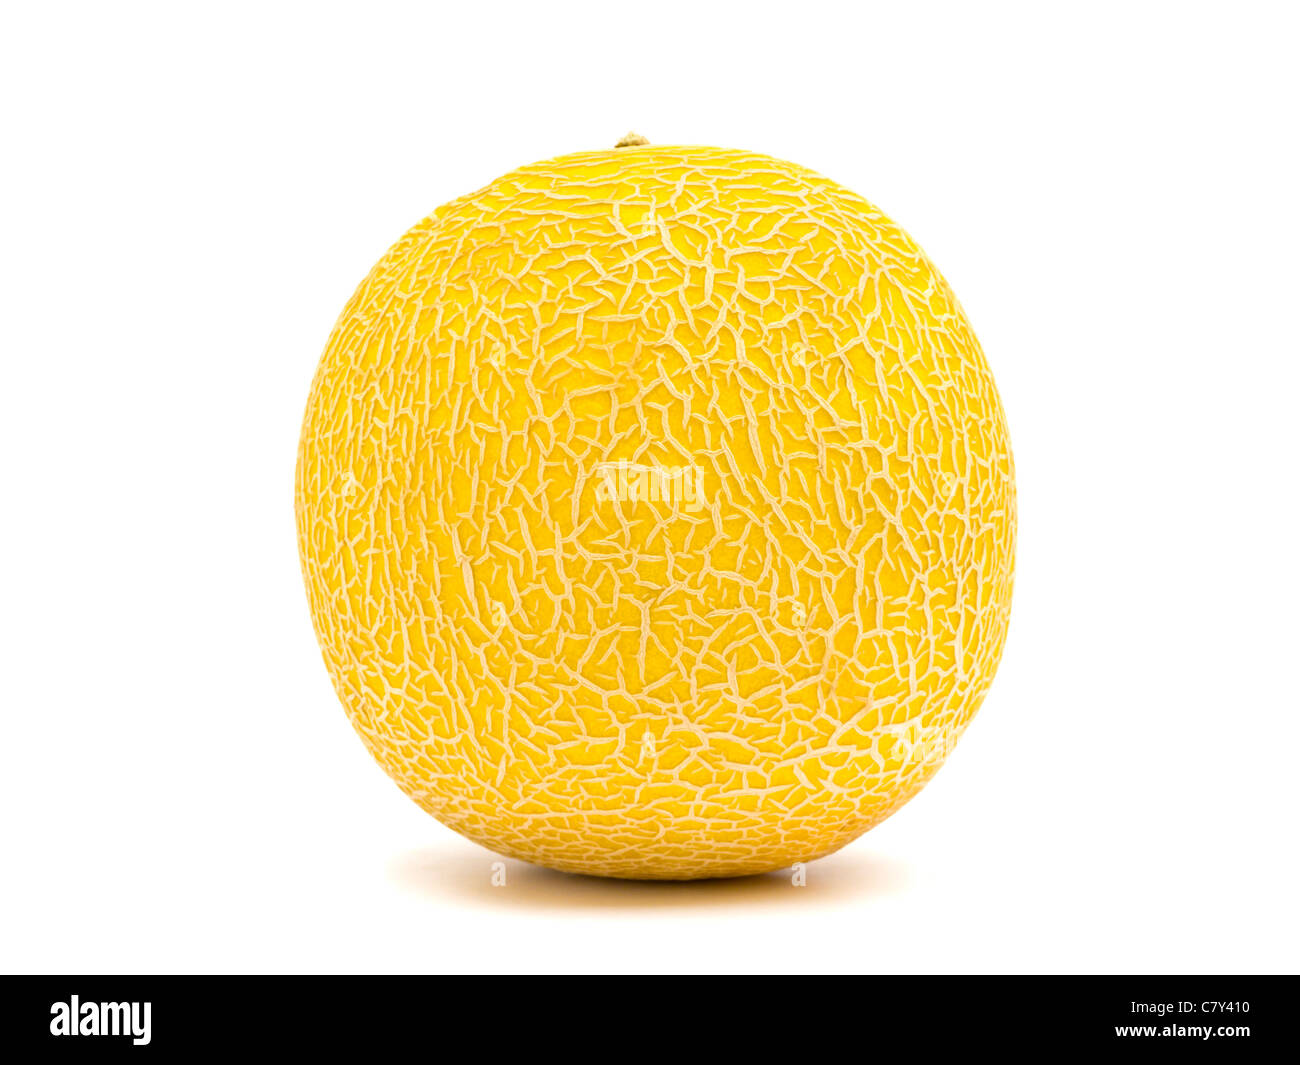 Cantaloupe Melon Up Close - Stock Image